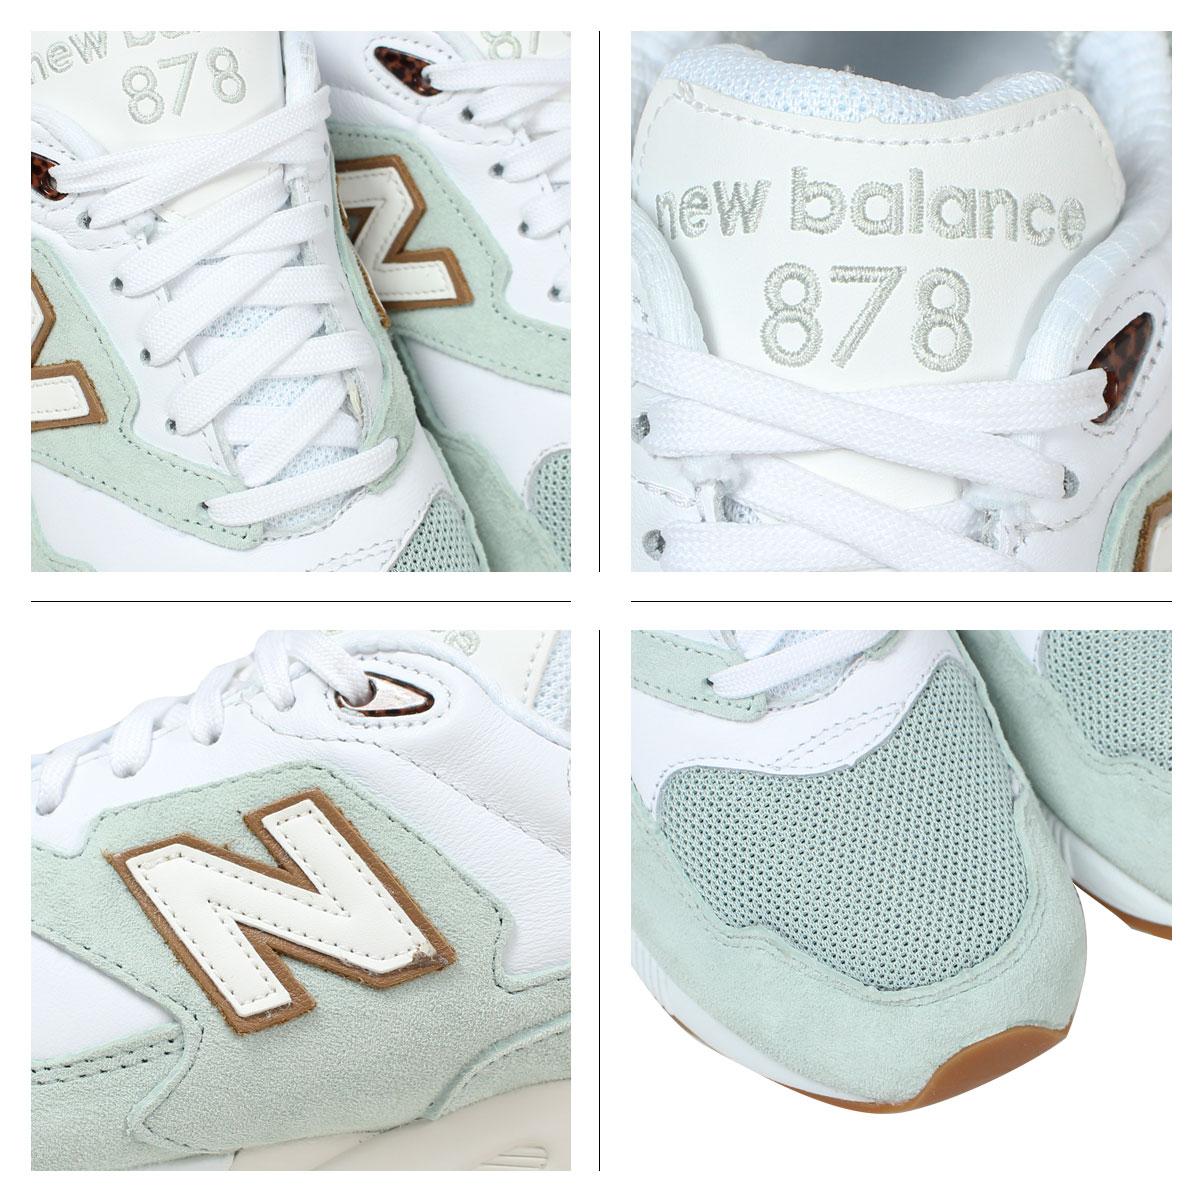 sports shoes e3998 73c36 new balance 878 white